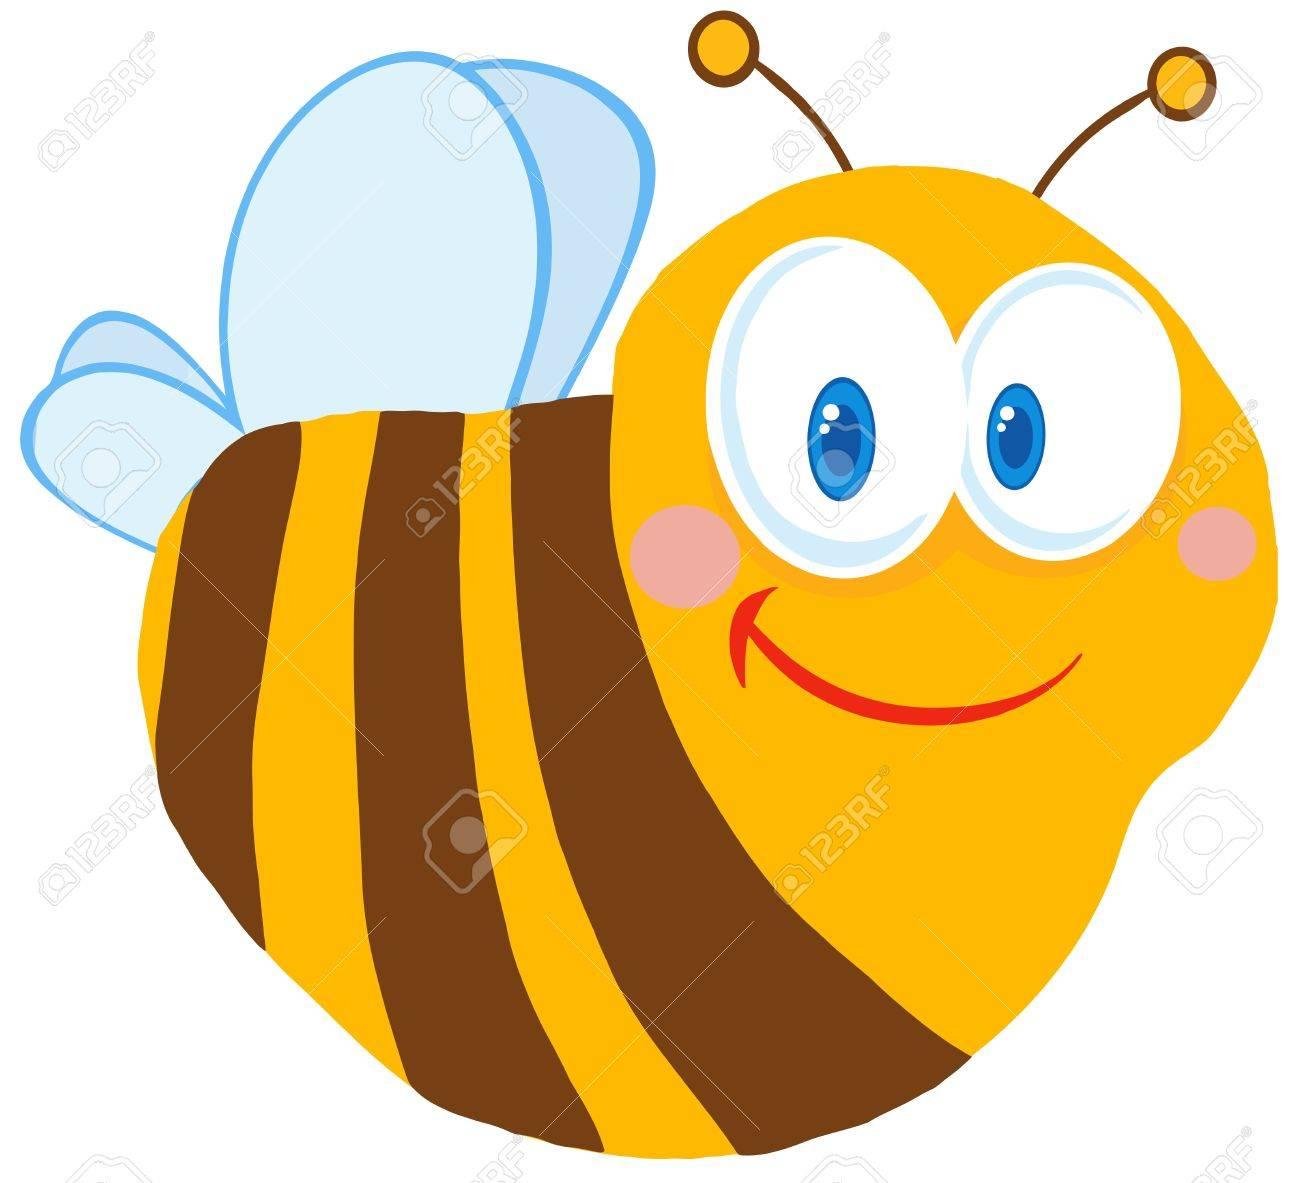 Cute Bee Cartoon Character Stock Vector - 12352726